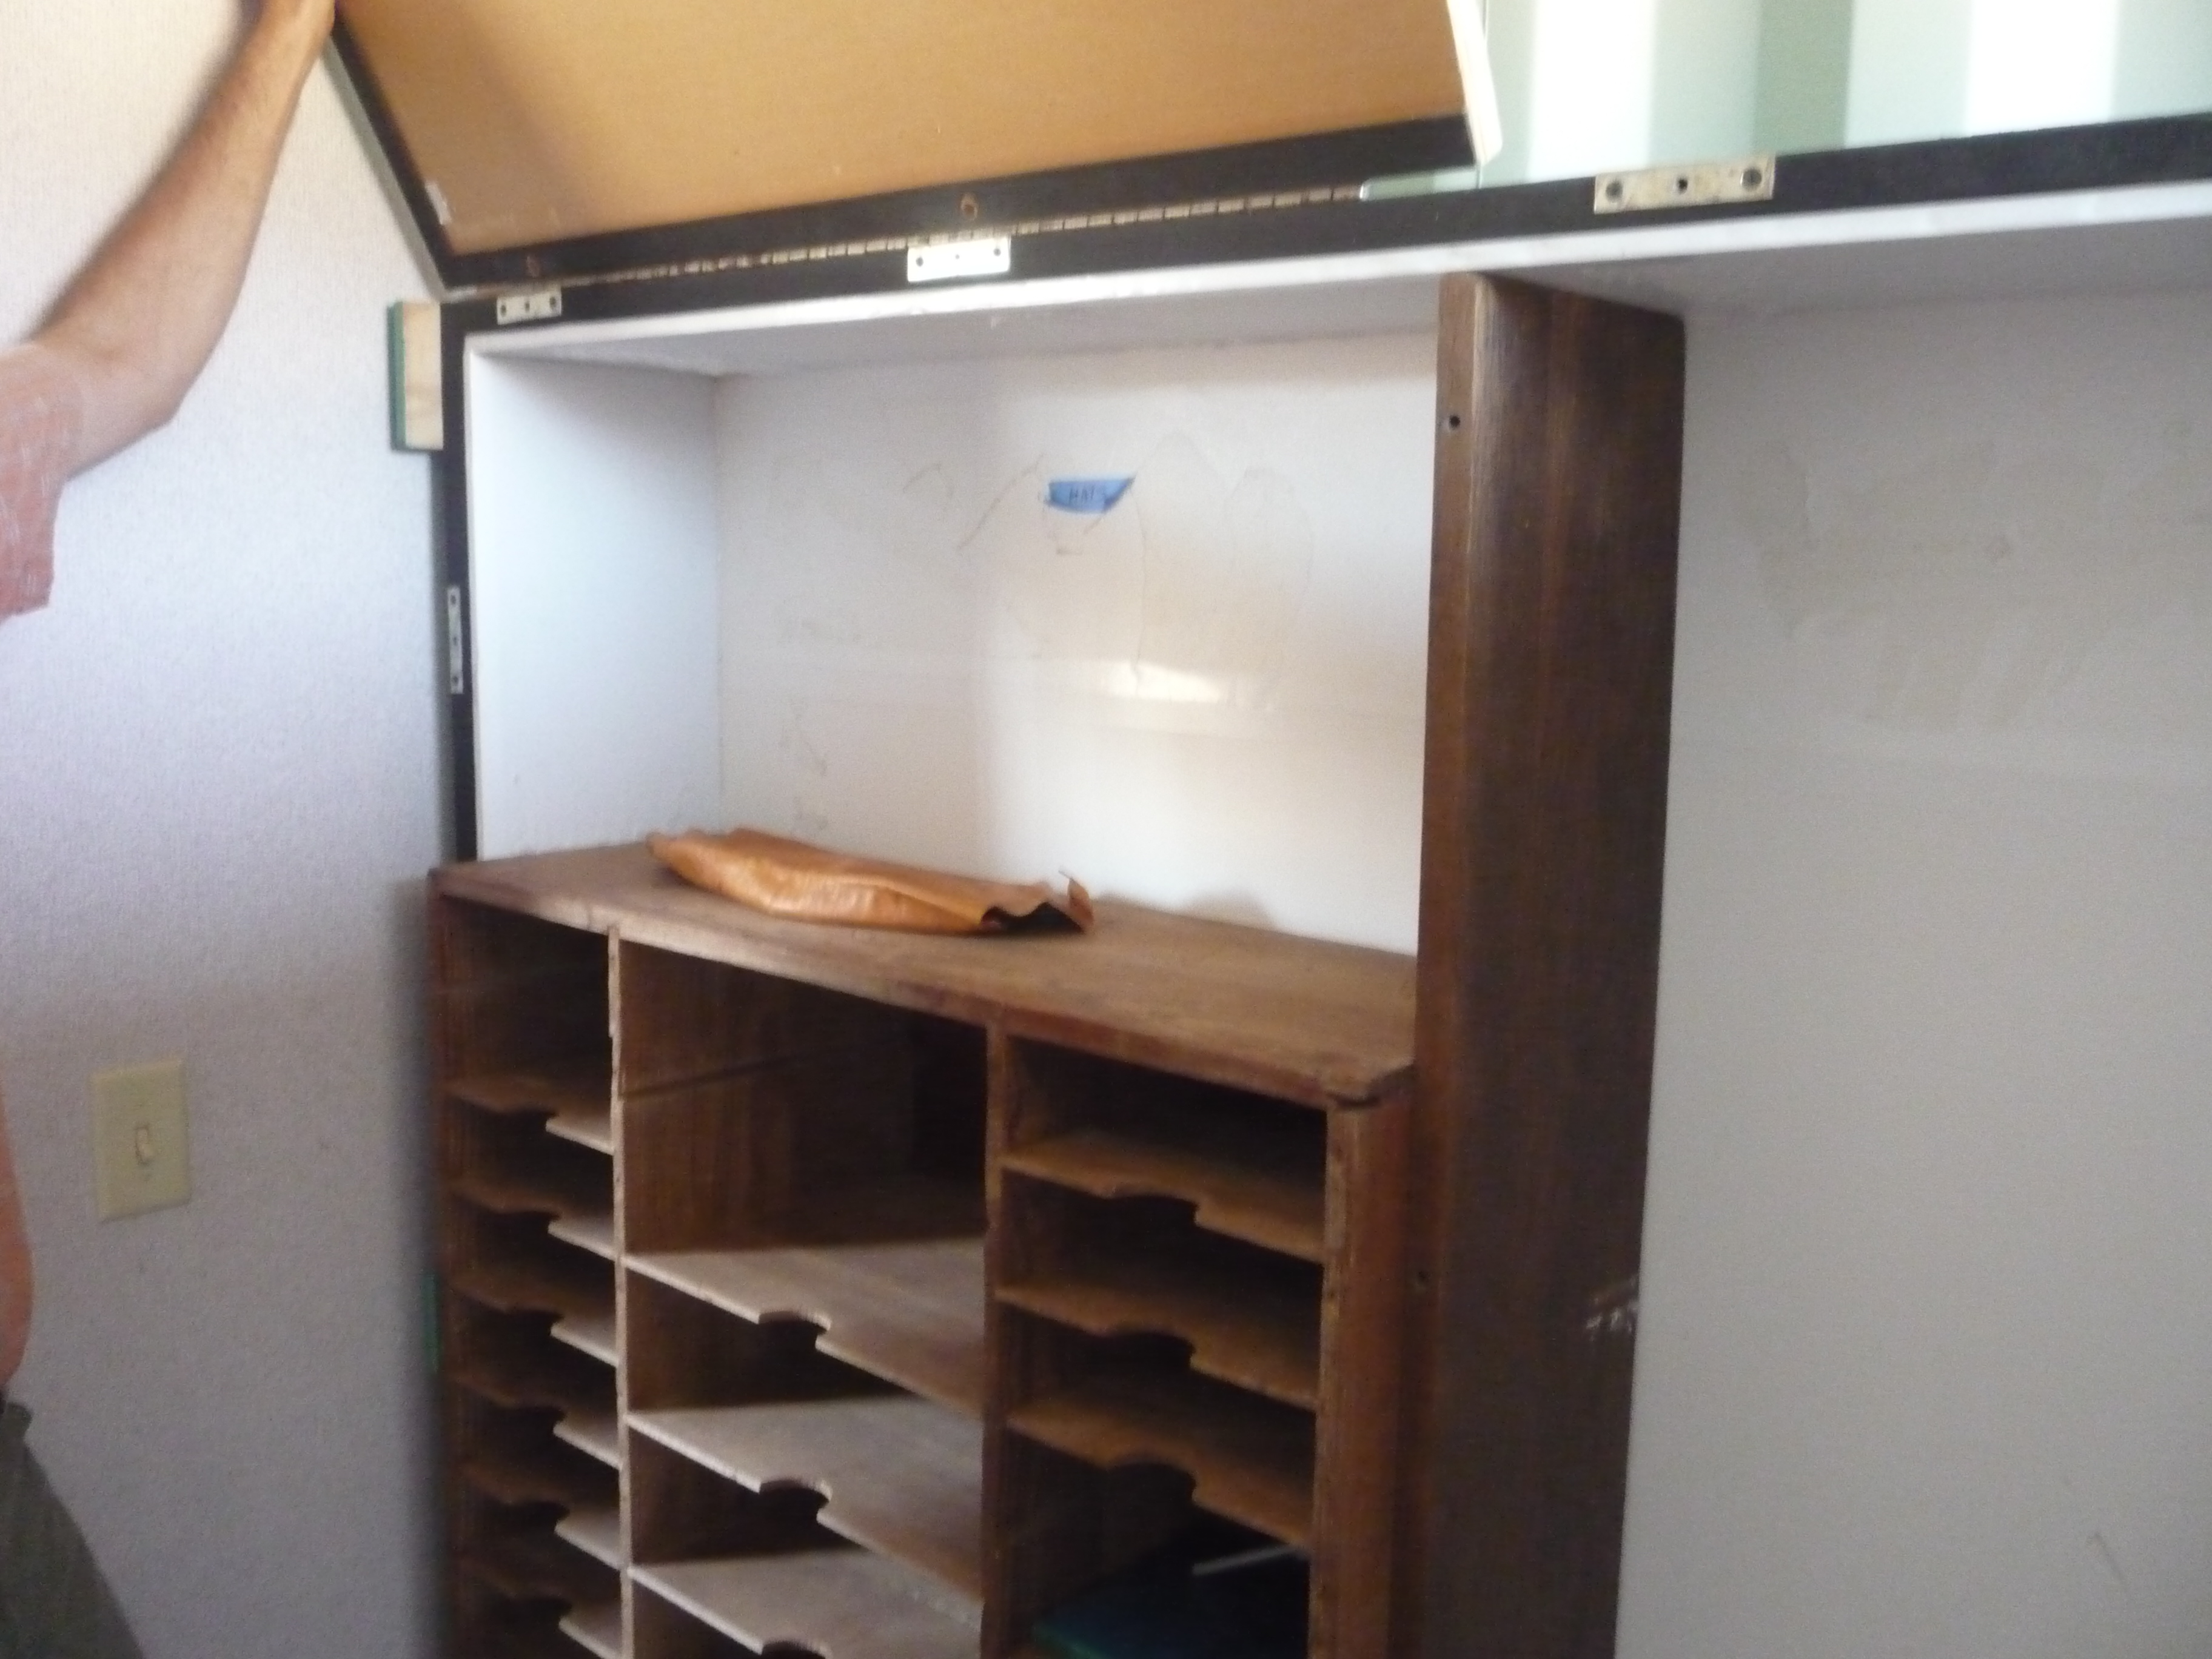 Reused Furniture this week in the shop: reused furniture | woodshopcowboy